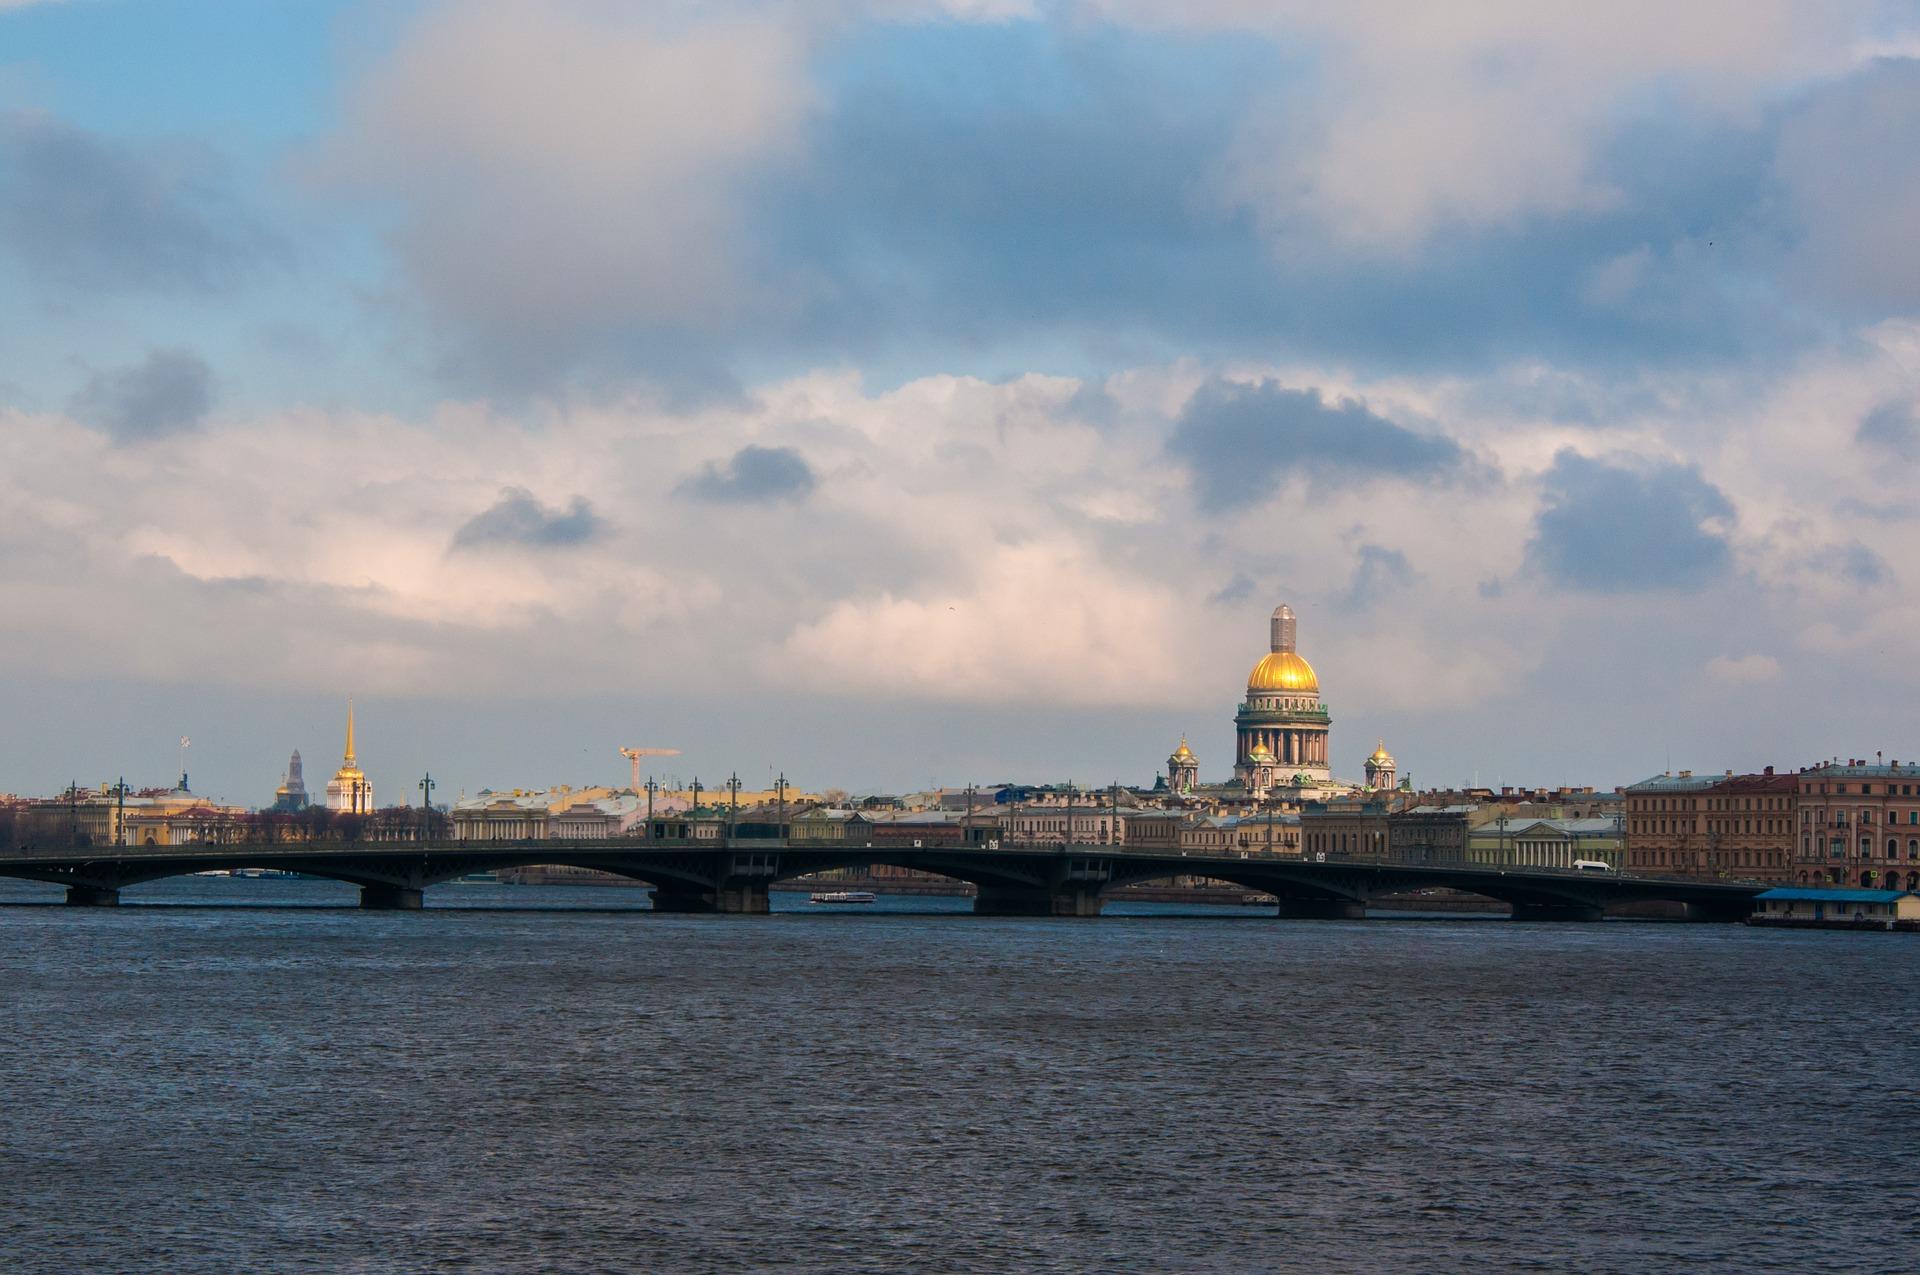 Благовещенский мост архитектура